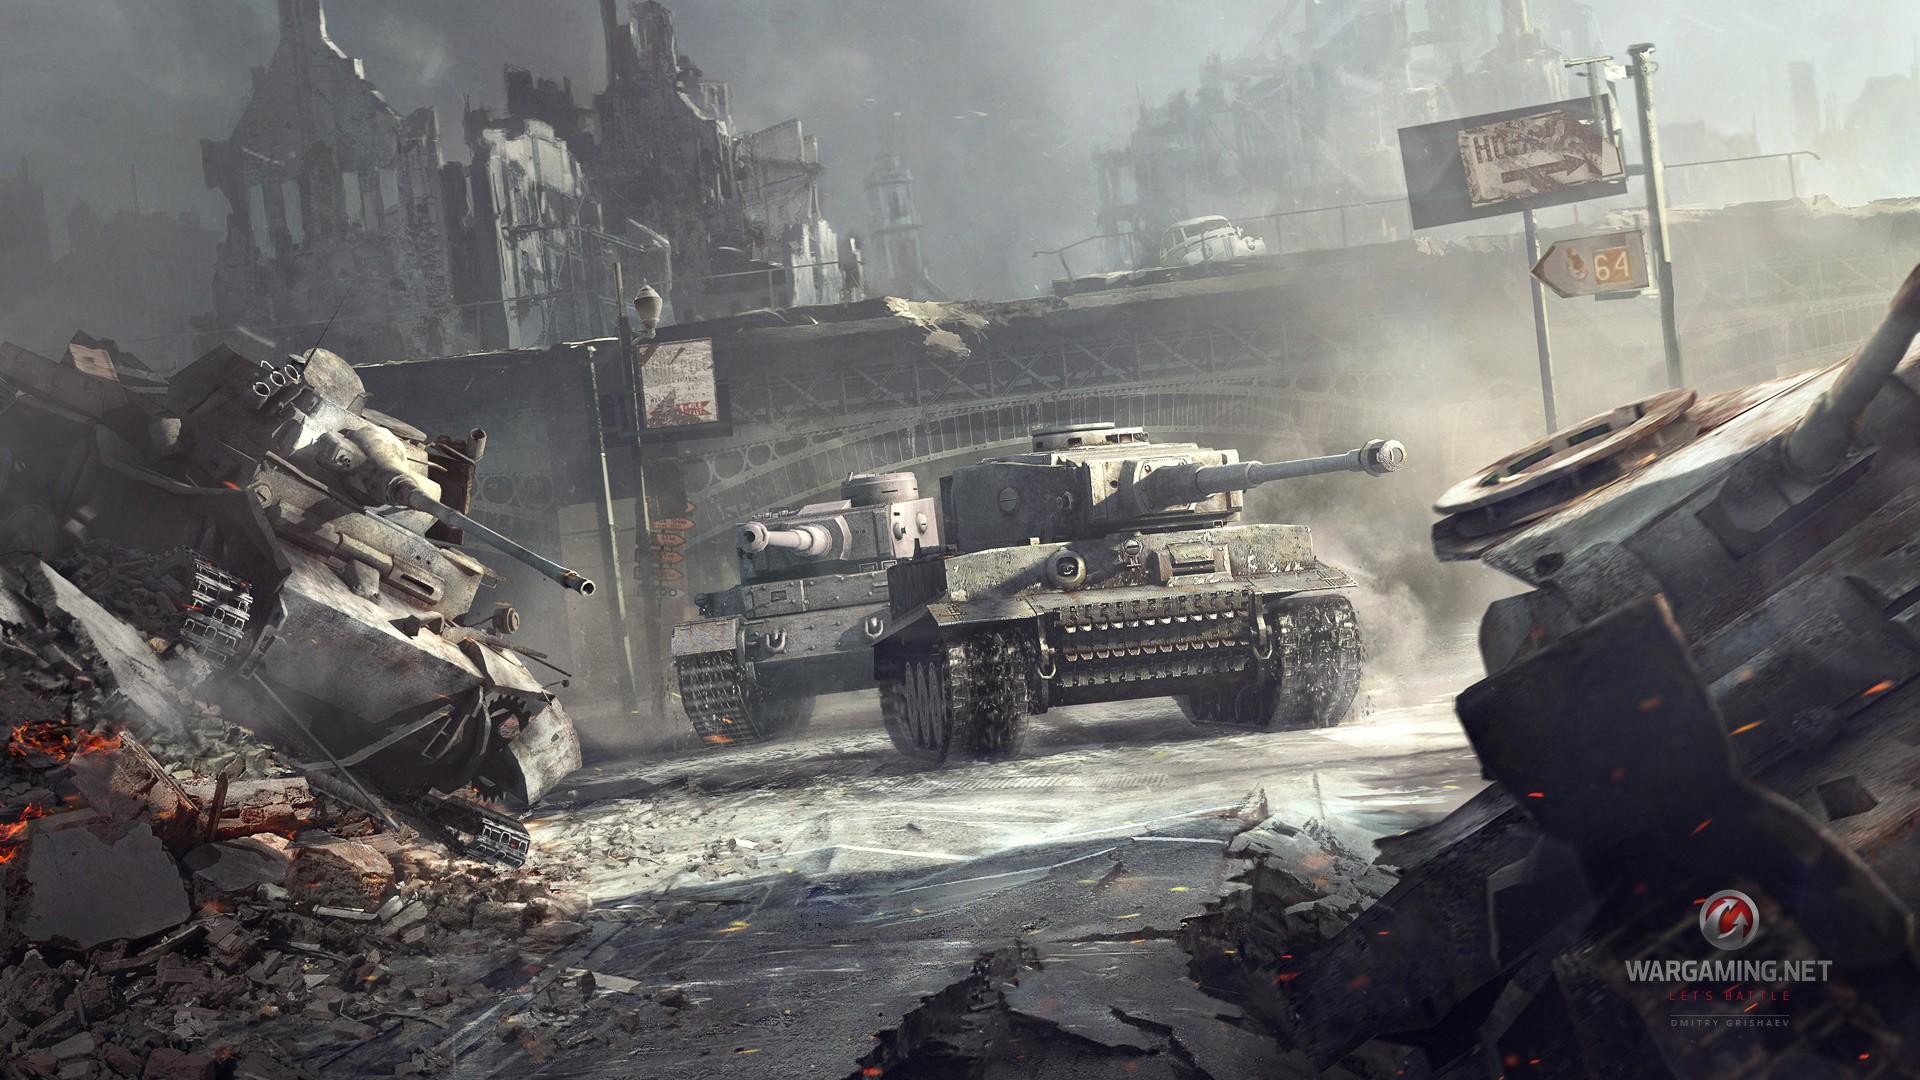 war-game-world-of-tanks-hd-1920%C3%971080-wallpaper-wp38011871